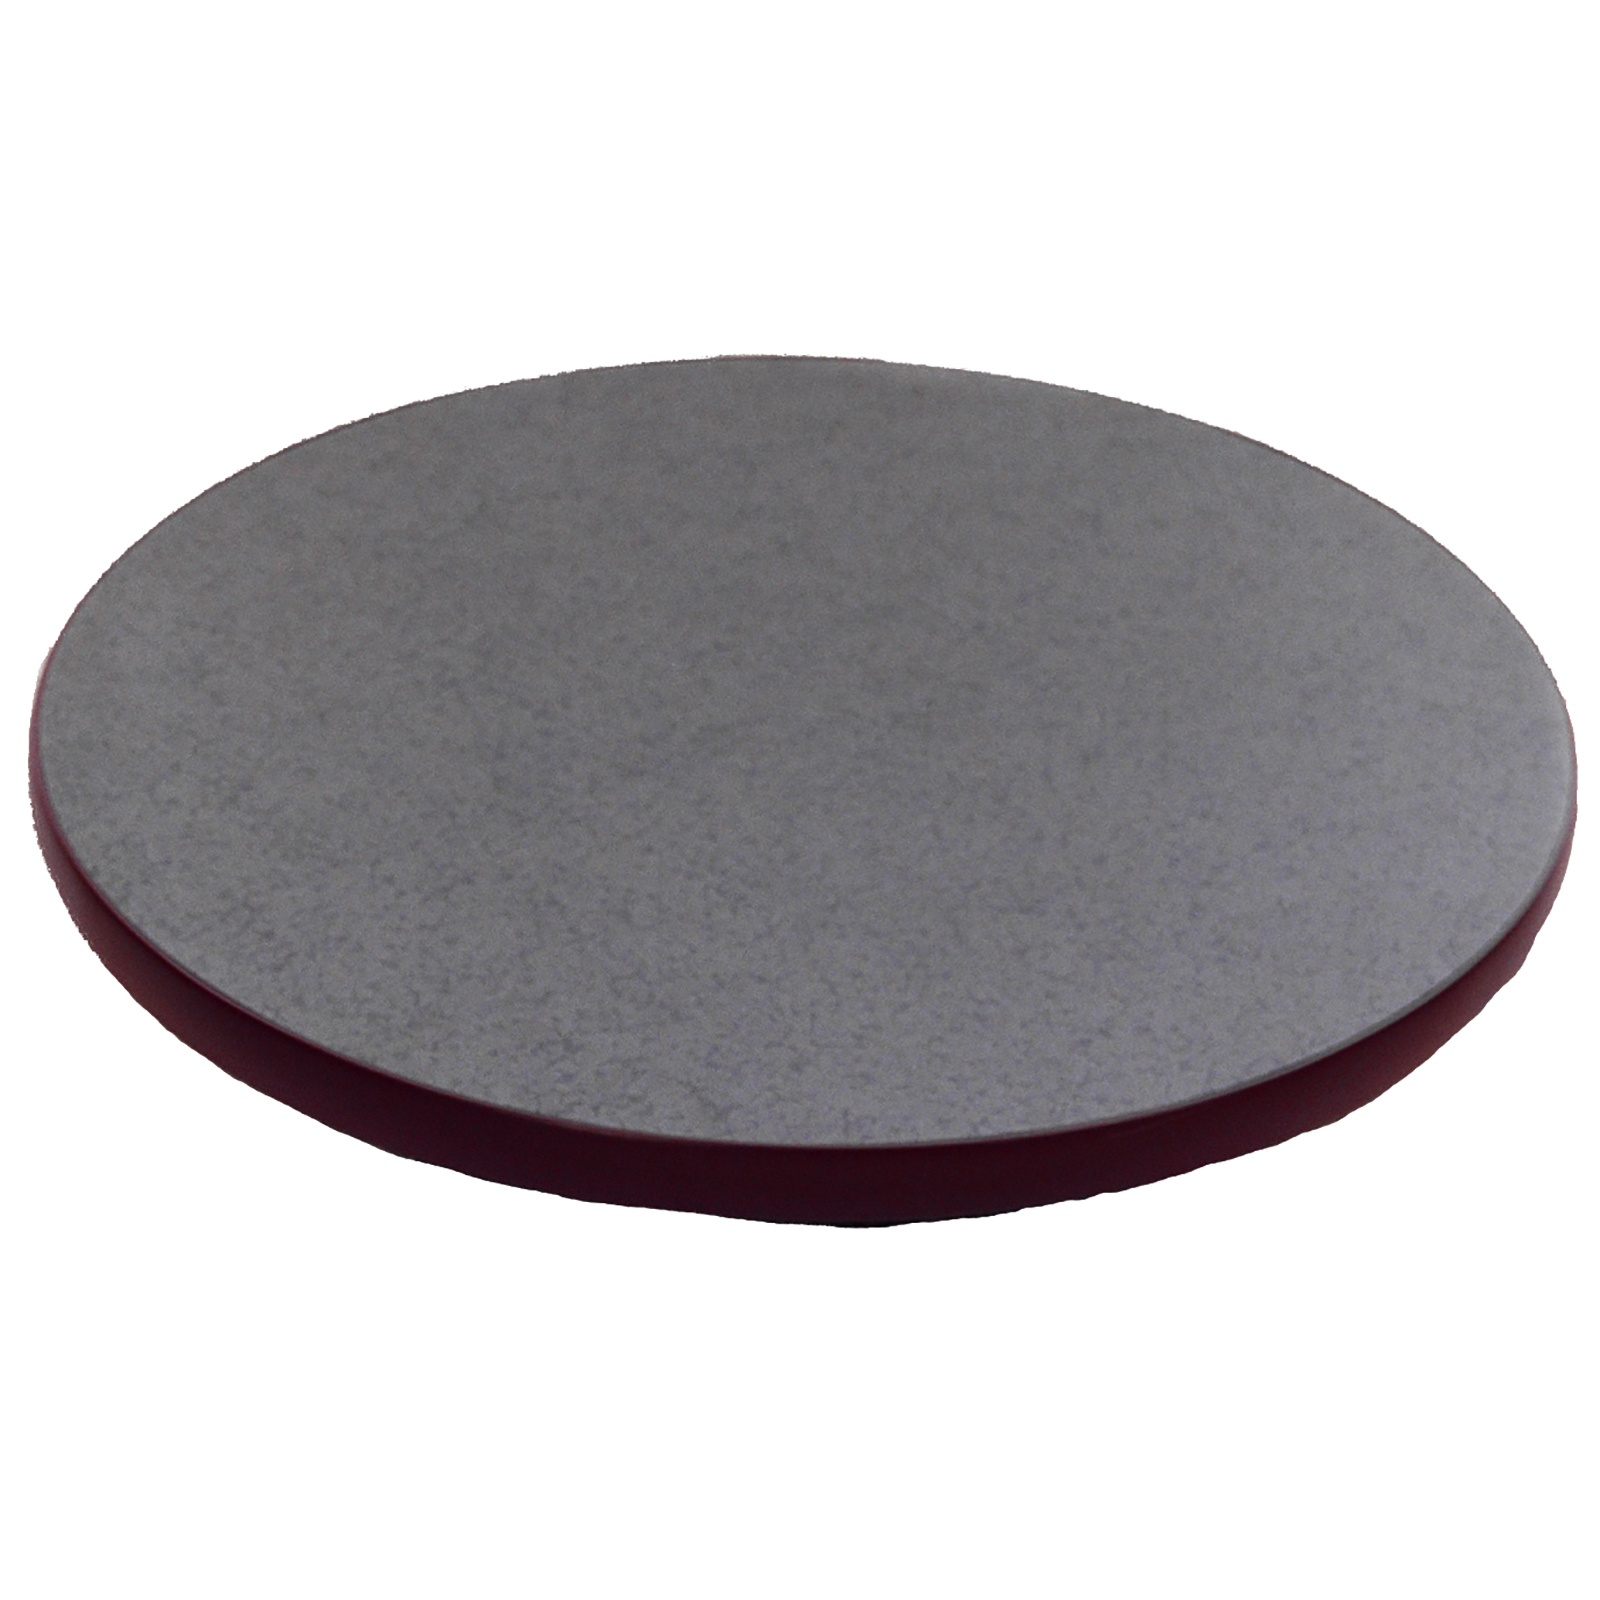 Oak Street CTM48R-1 table top, laminate